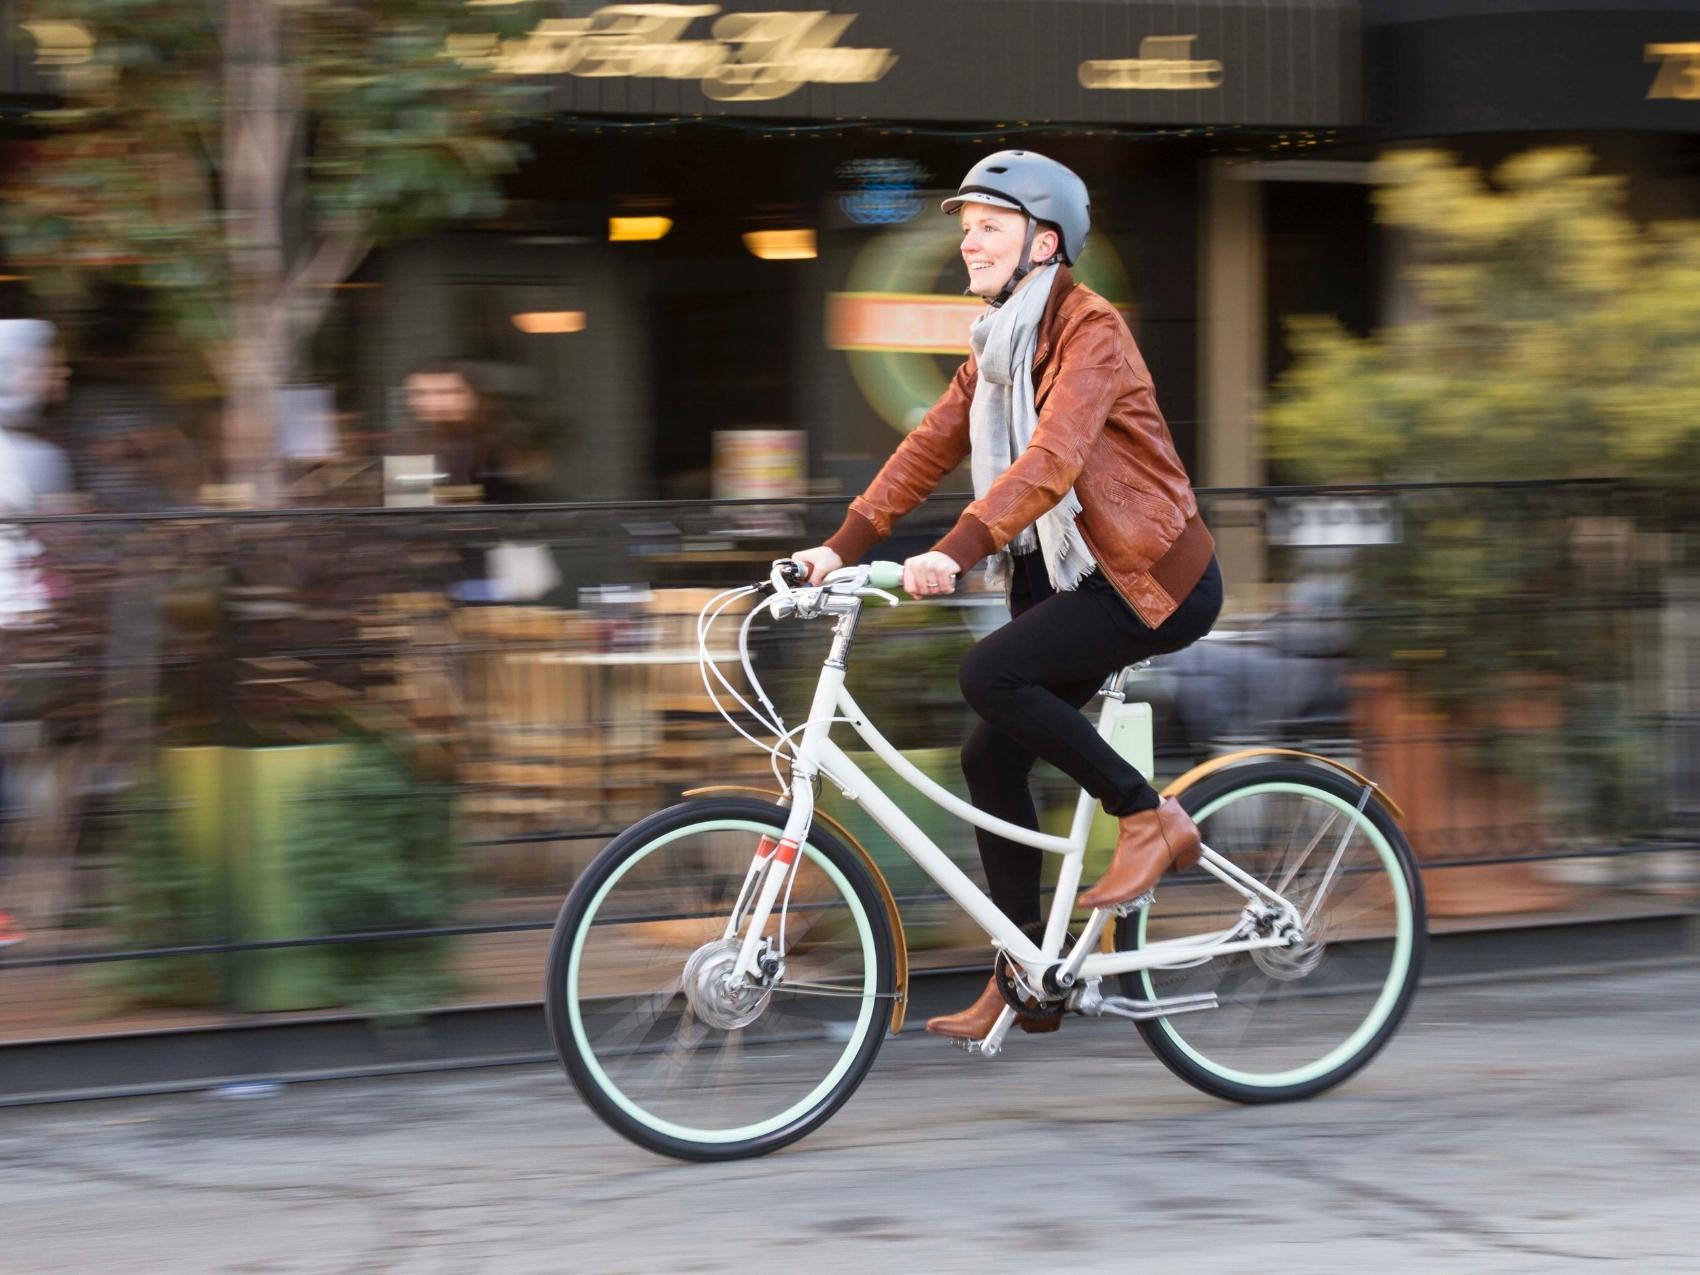 Faraday Cortland eBike; image courtesy of Faraday Bikes